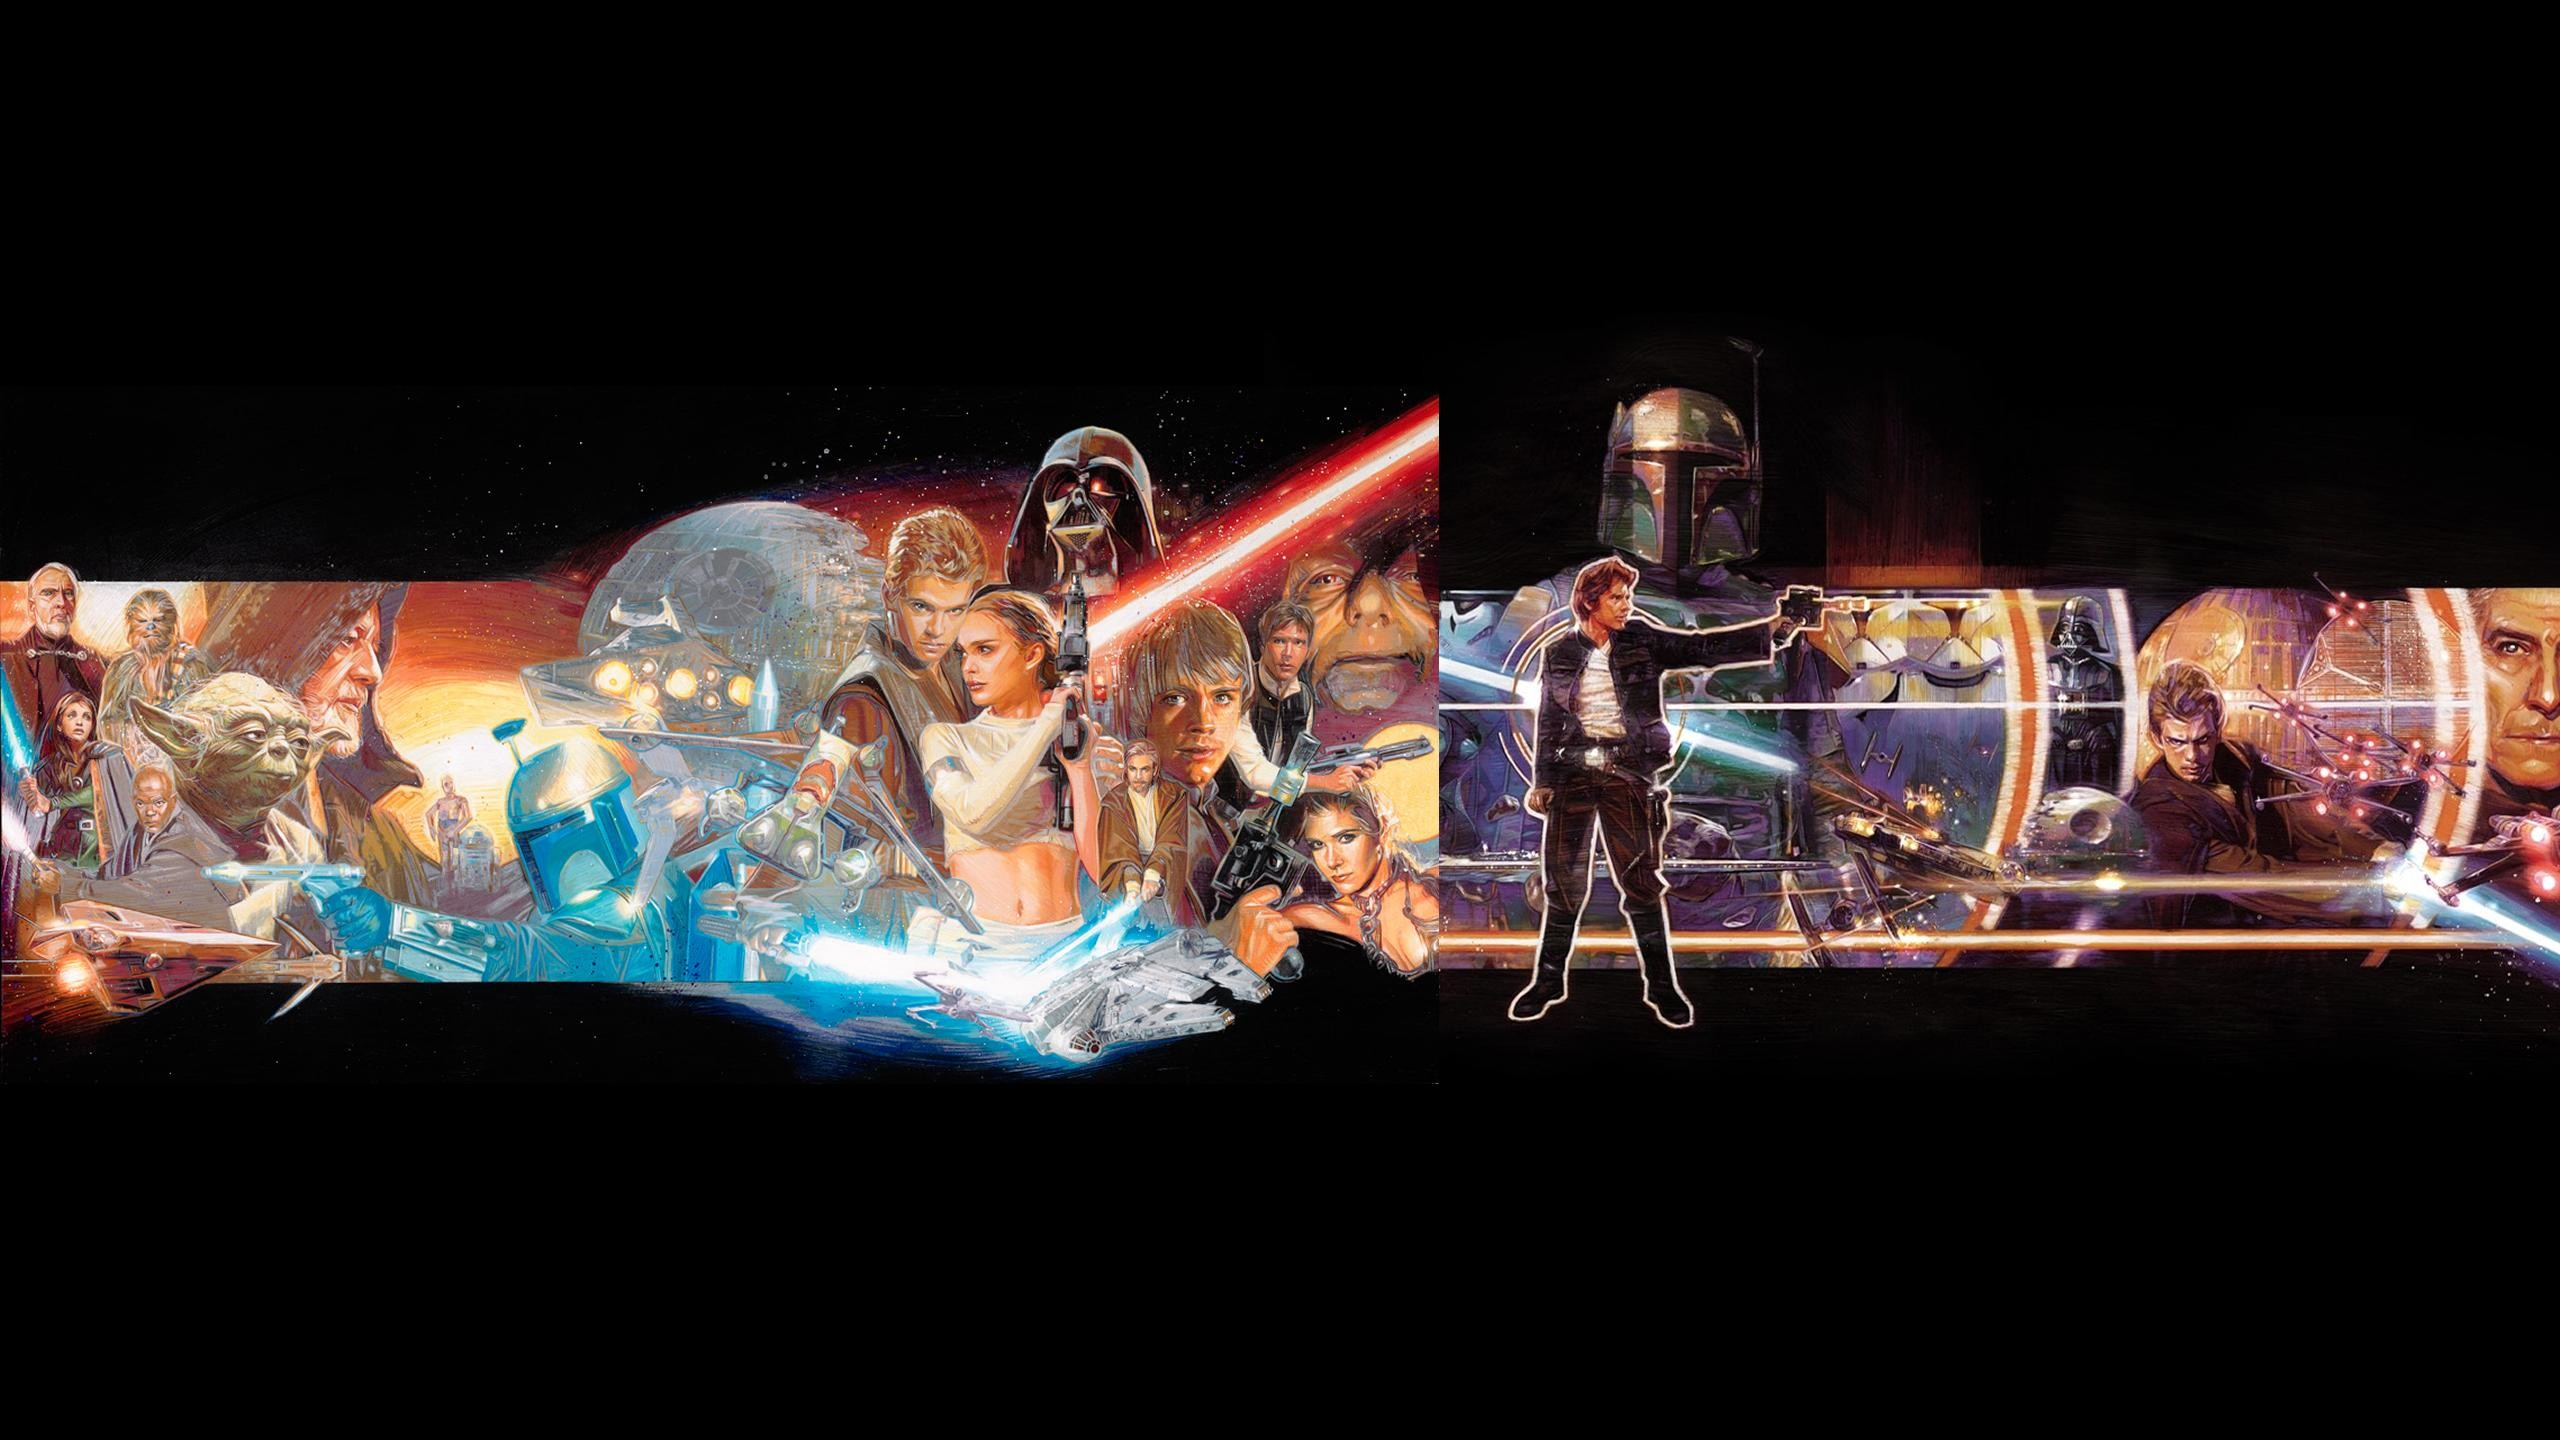 Sith Wallpaper Hd 5760x1080 Star Wars Wallpaper 23 Images